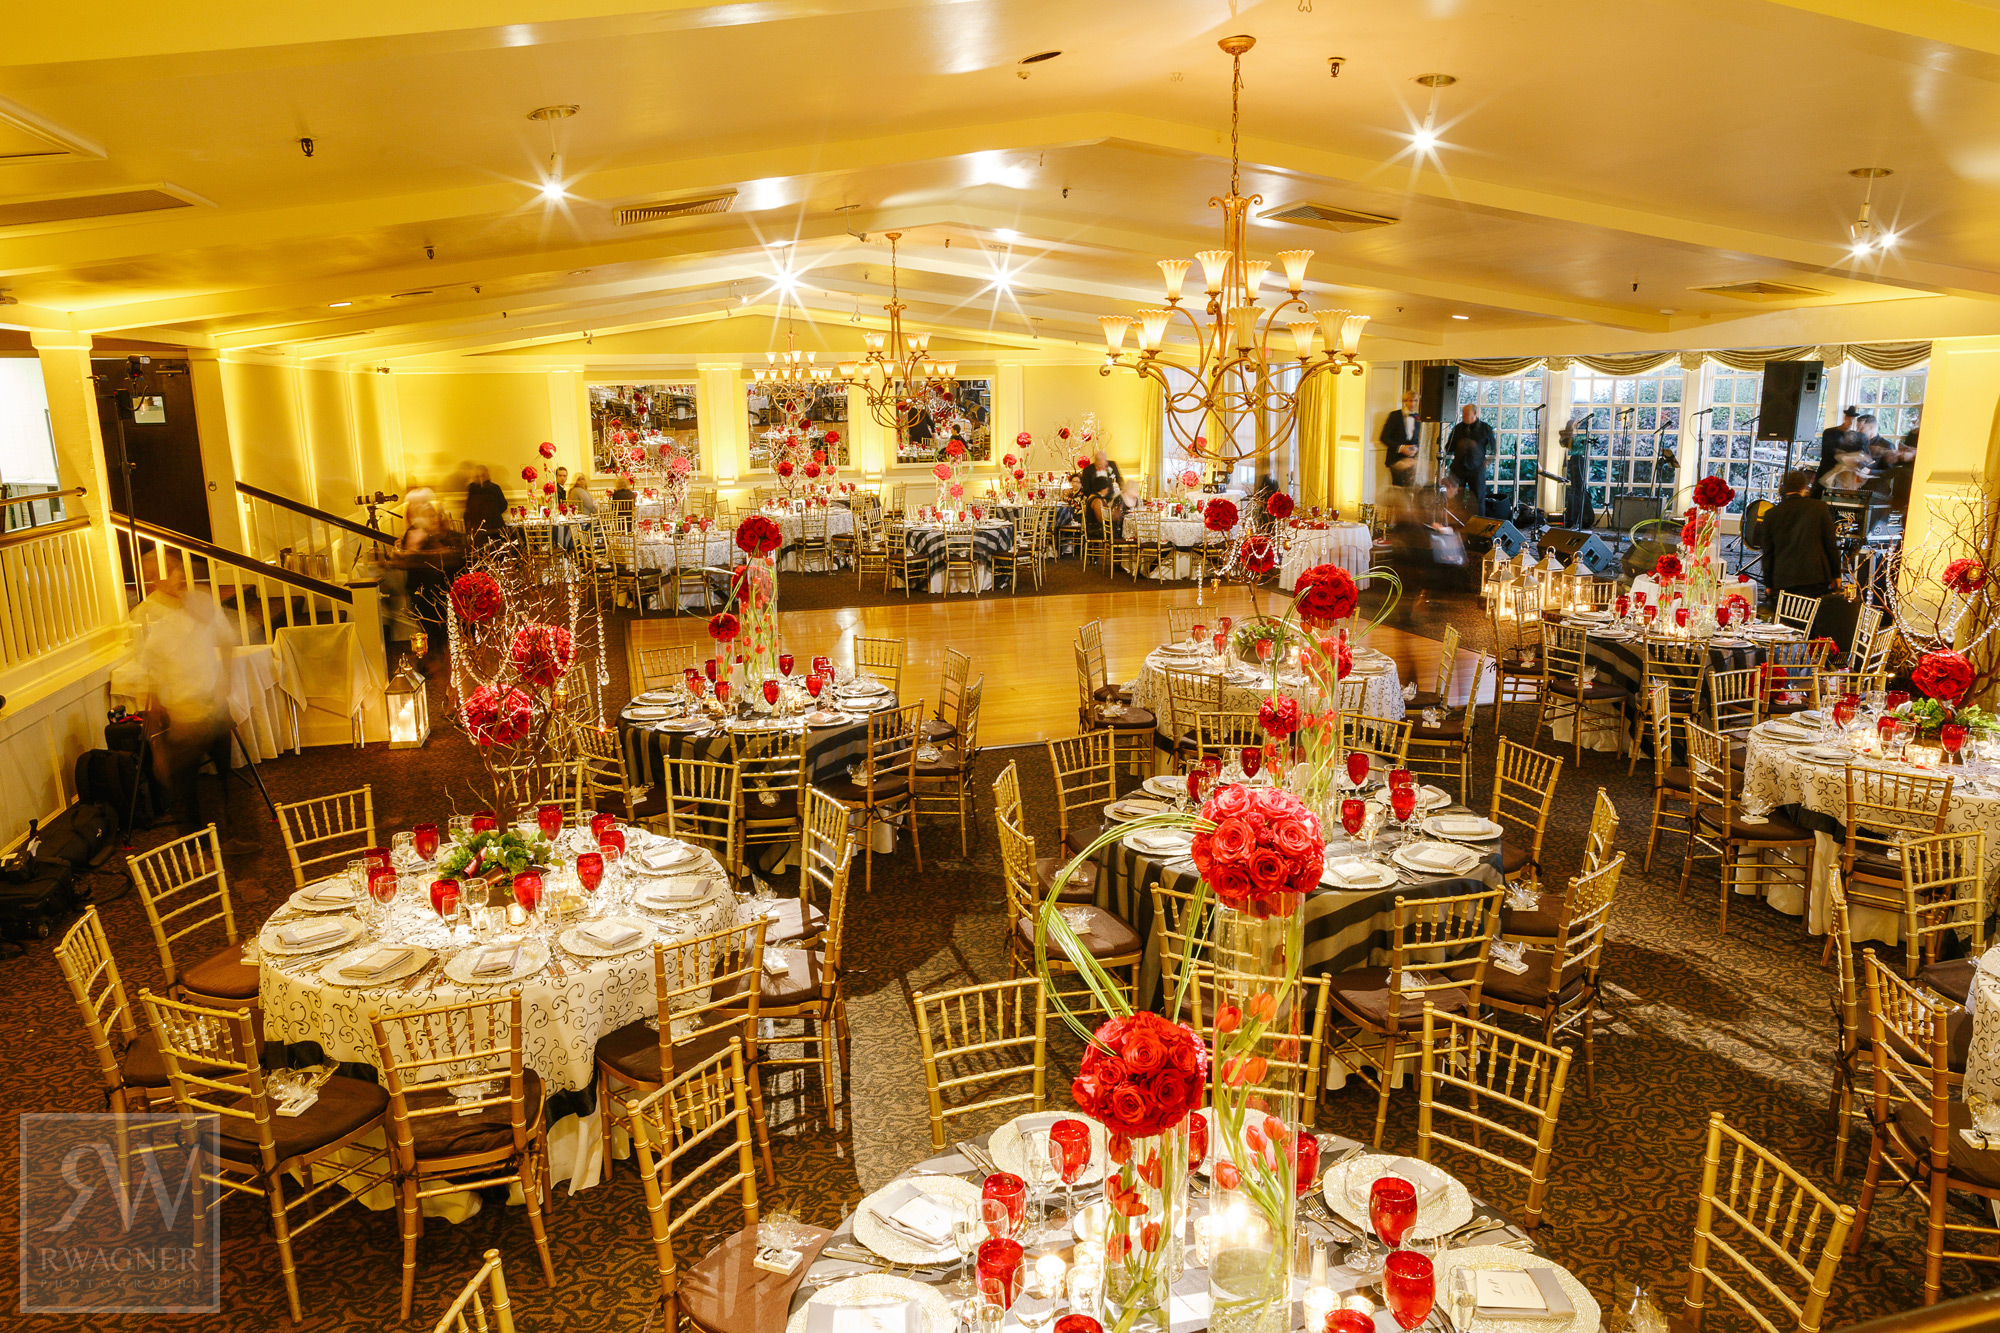 ceci_new_york_luxury_wedding_invitations_couture_red_black_white_real_wedding_dramatic_inn_at_longshore_v286_31.jpg